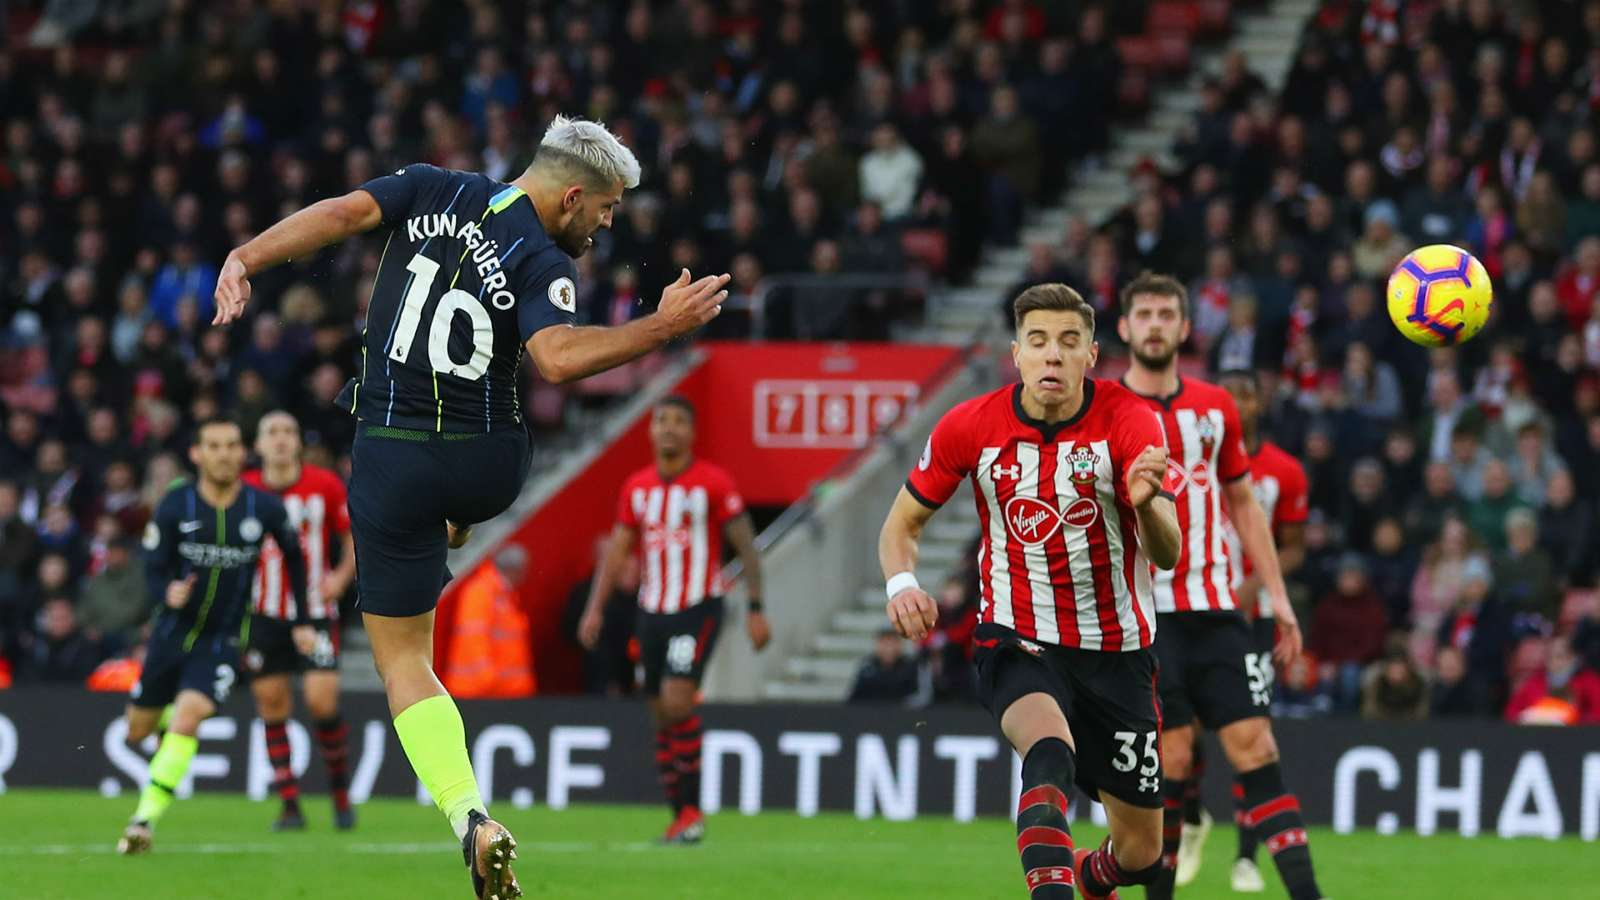 sergioaguero cropped 11nje2xo0qcl313a0172dahrn3 - Watch: Southampton vs Manchester City 1-3: Premier League Highlights [Video]